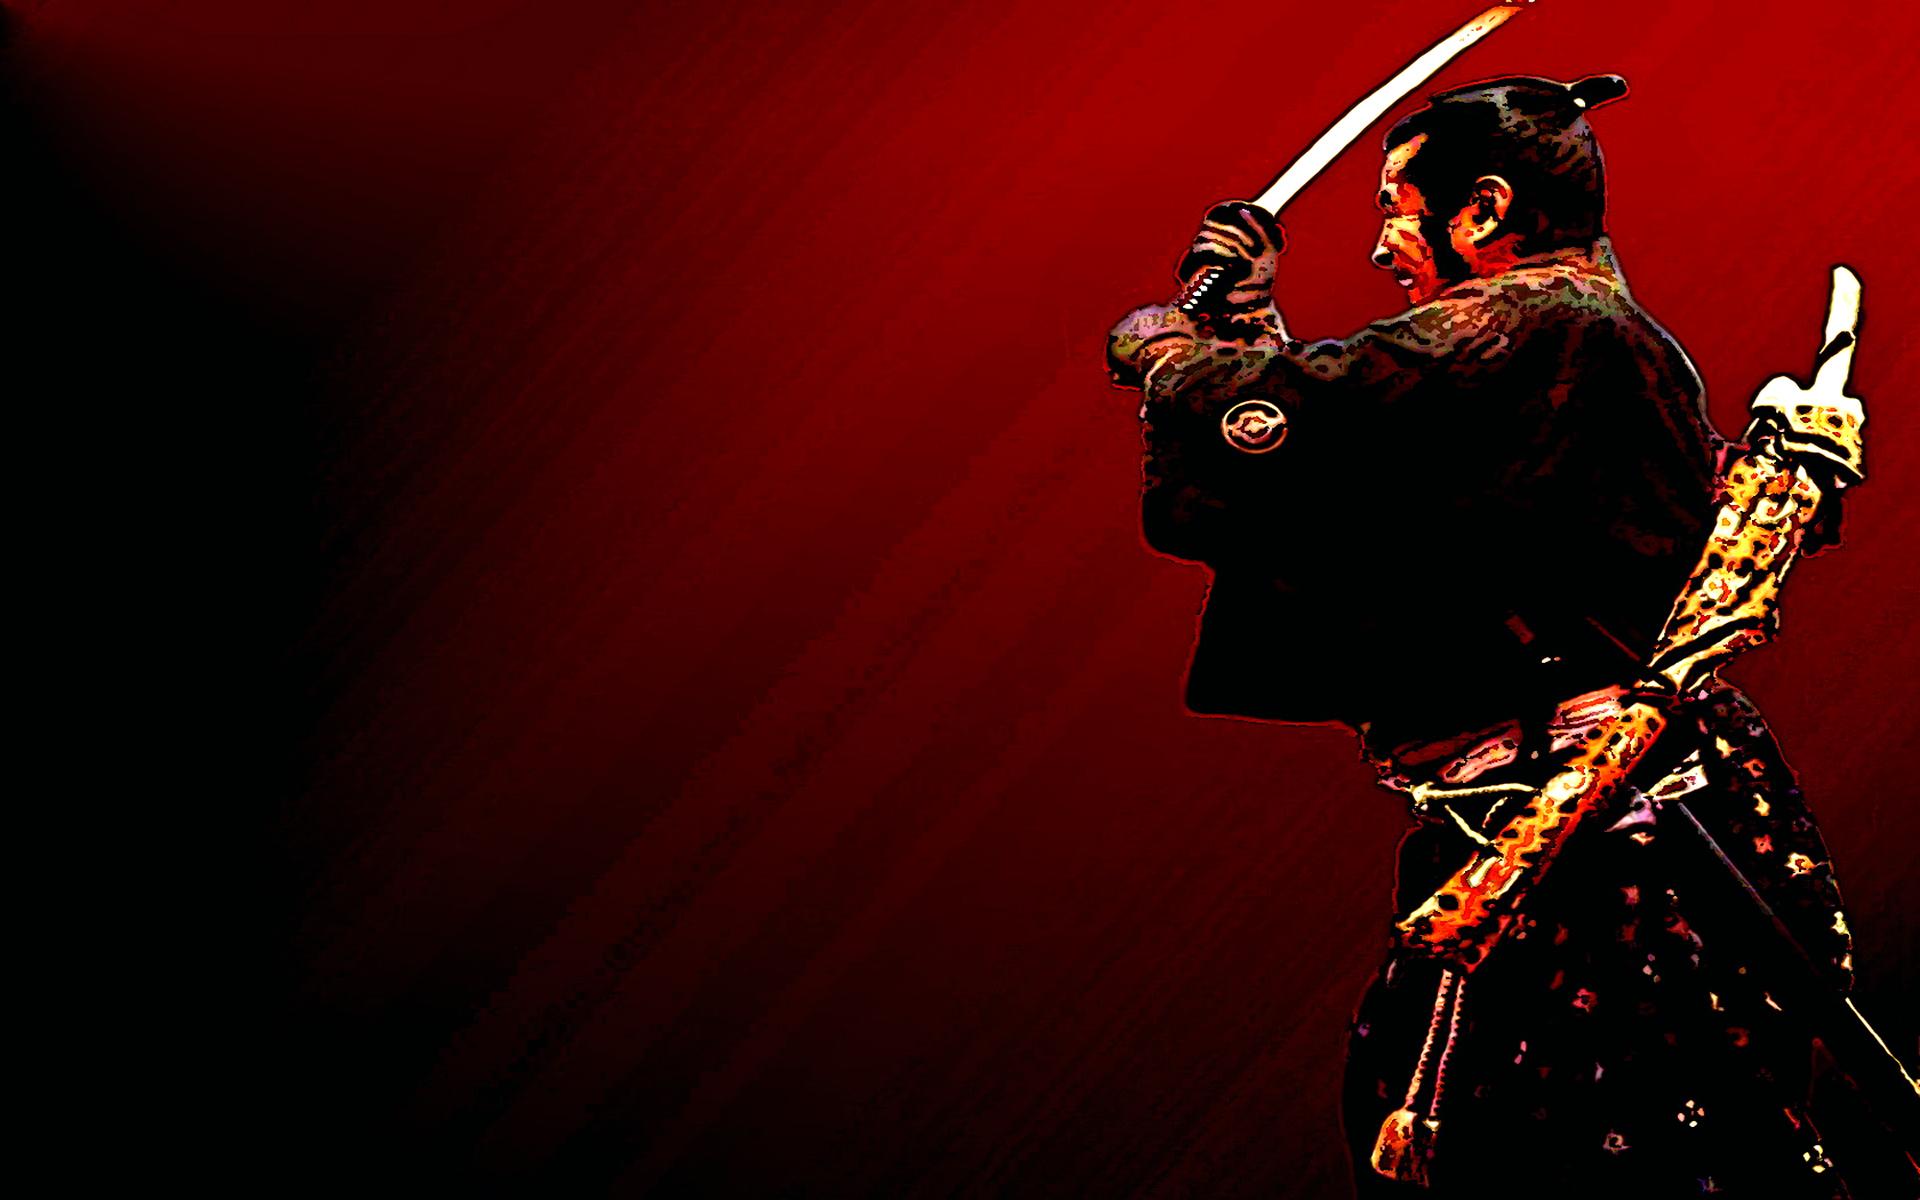 самурай на фото знаю так это